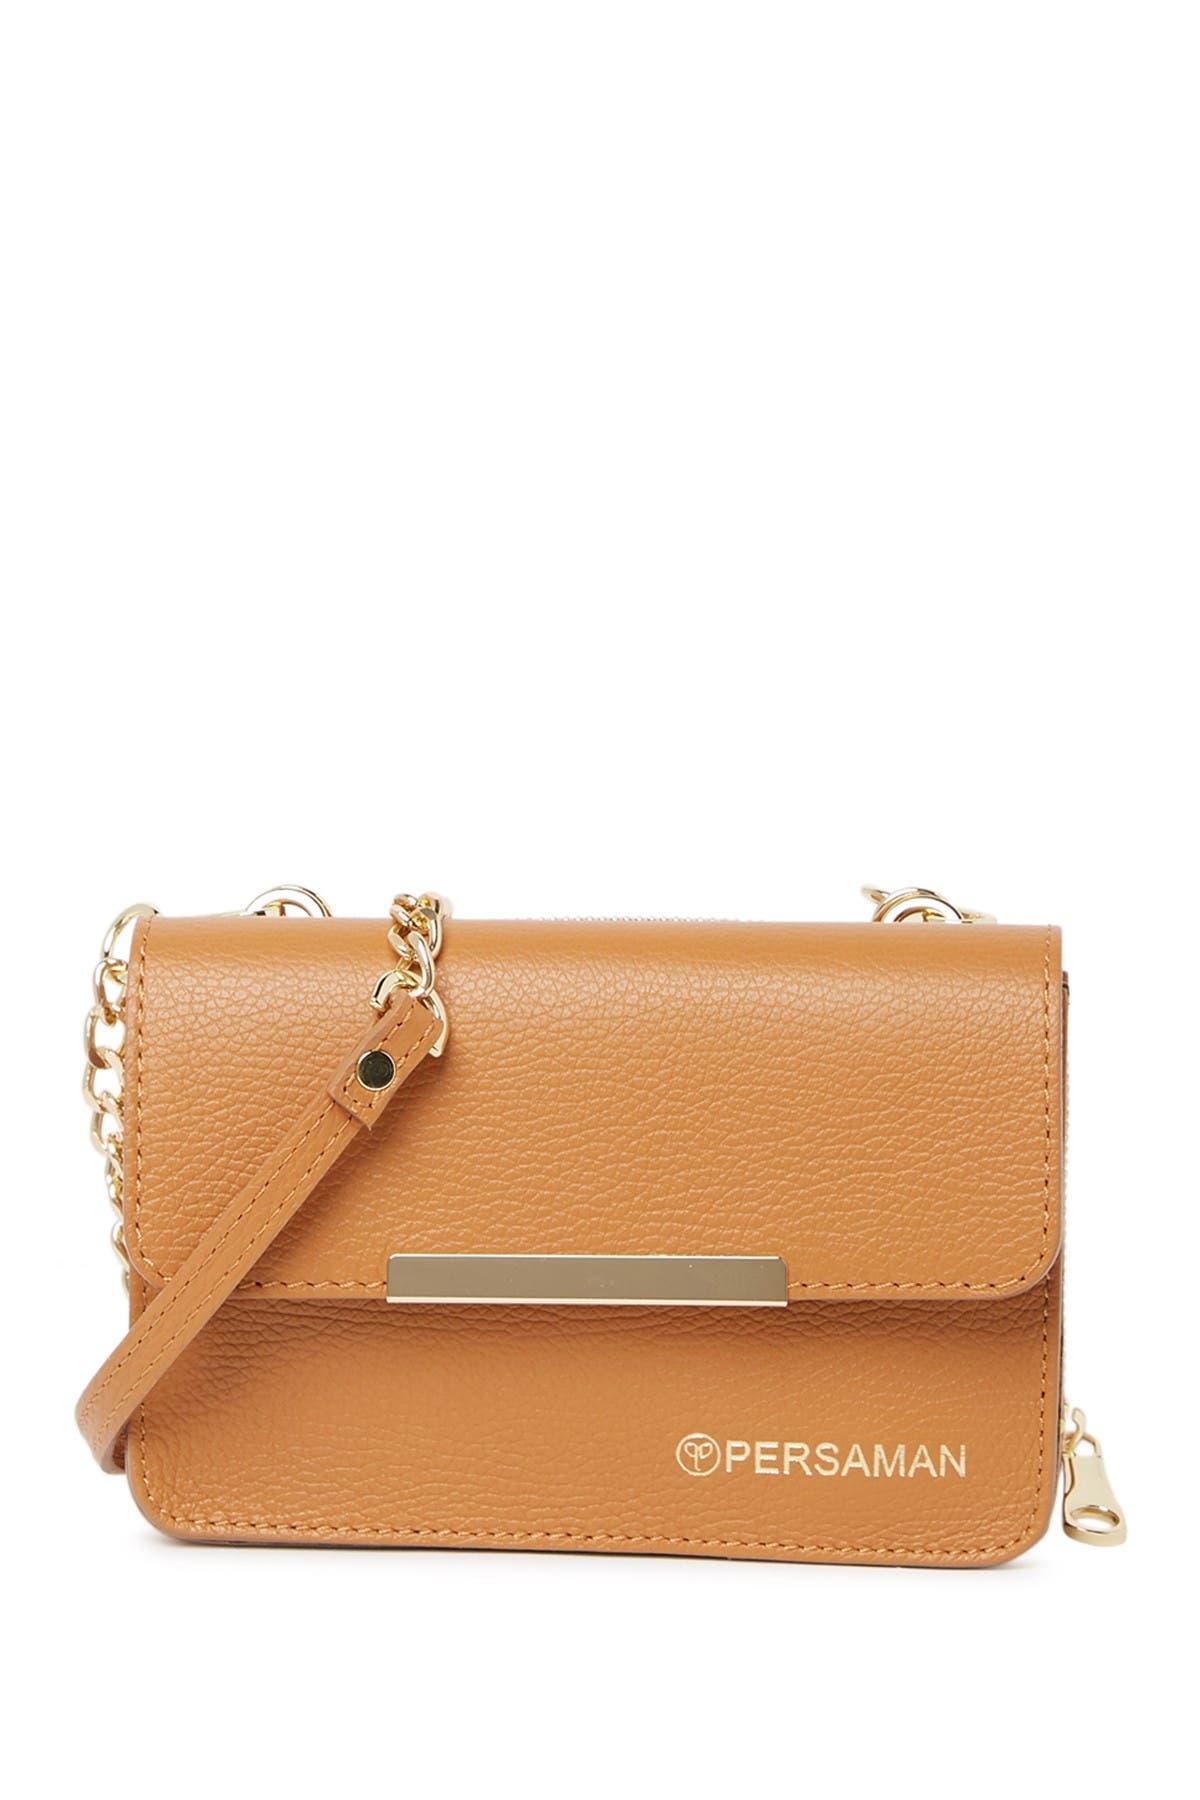 Persaman New York Blanch Satchel Bag at Nordstrom Rack